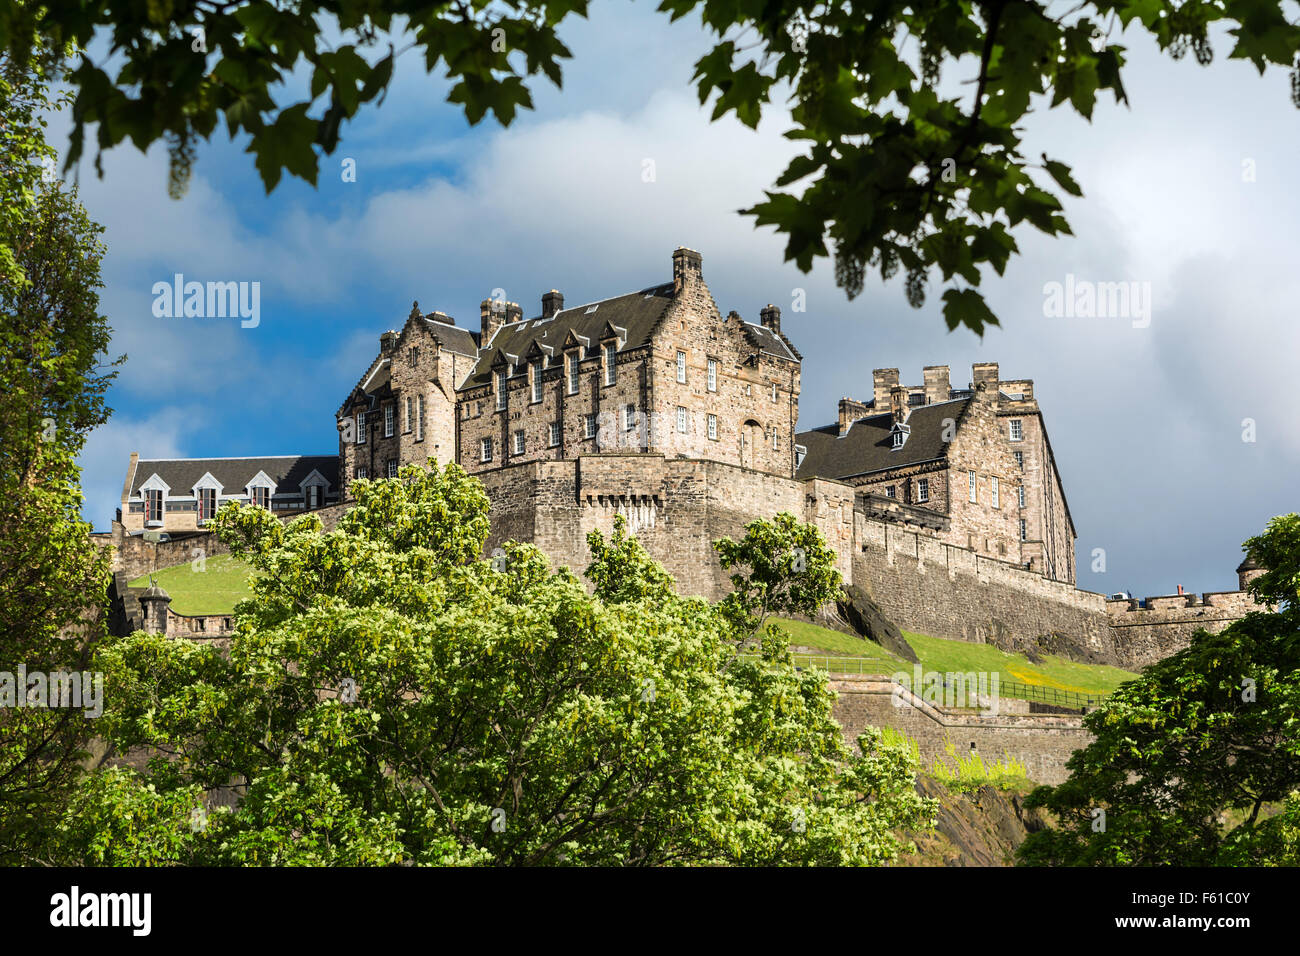 The North Walls of Edinburgh Castle, Scotland - Stock Image